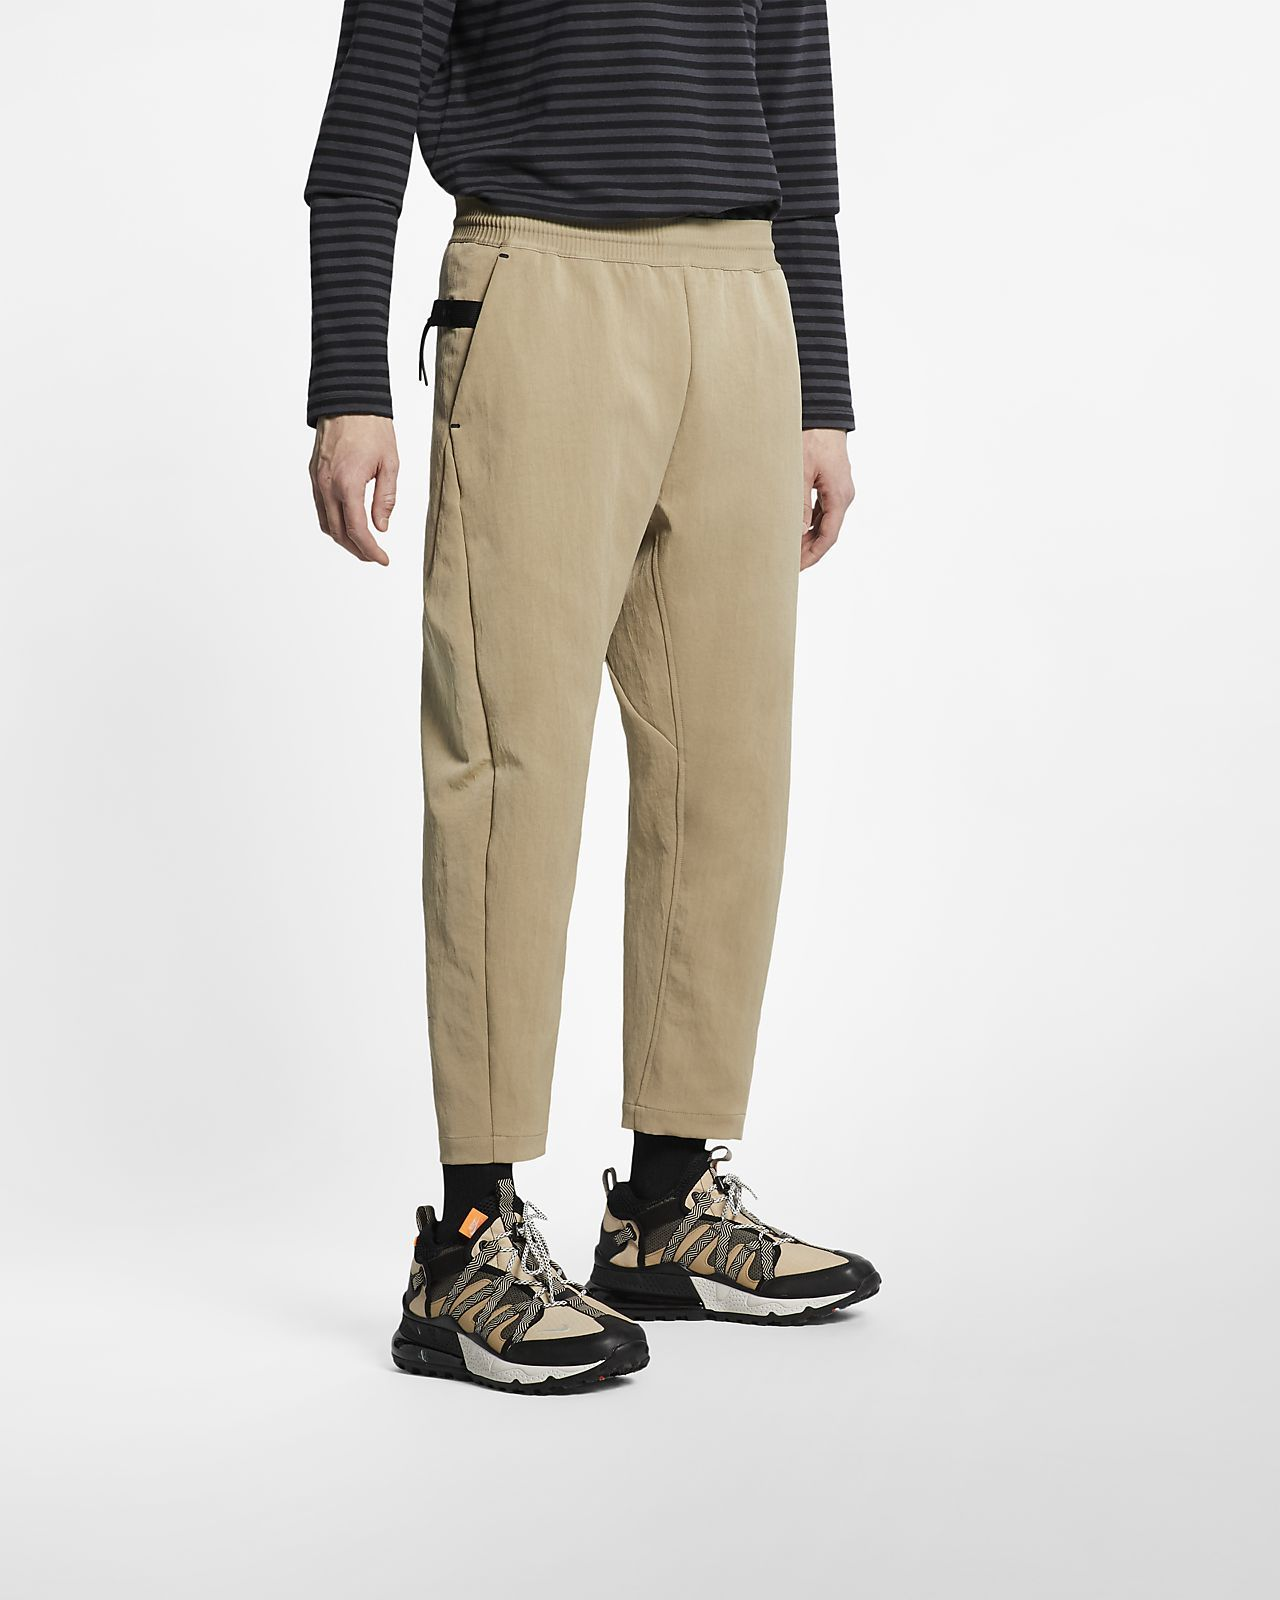 Stratford on Avon Fobia Madison  Nike Sportswear Tech Pack Men's Cropped Woven Pants | Running shorts men,  Mens pants sizes, Mens pants